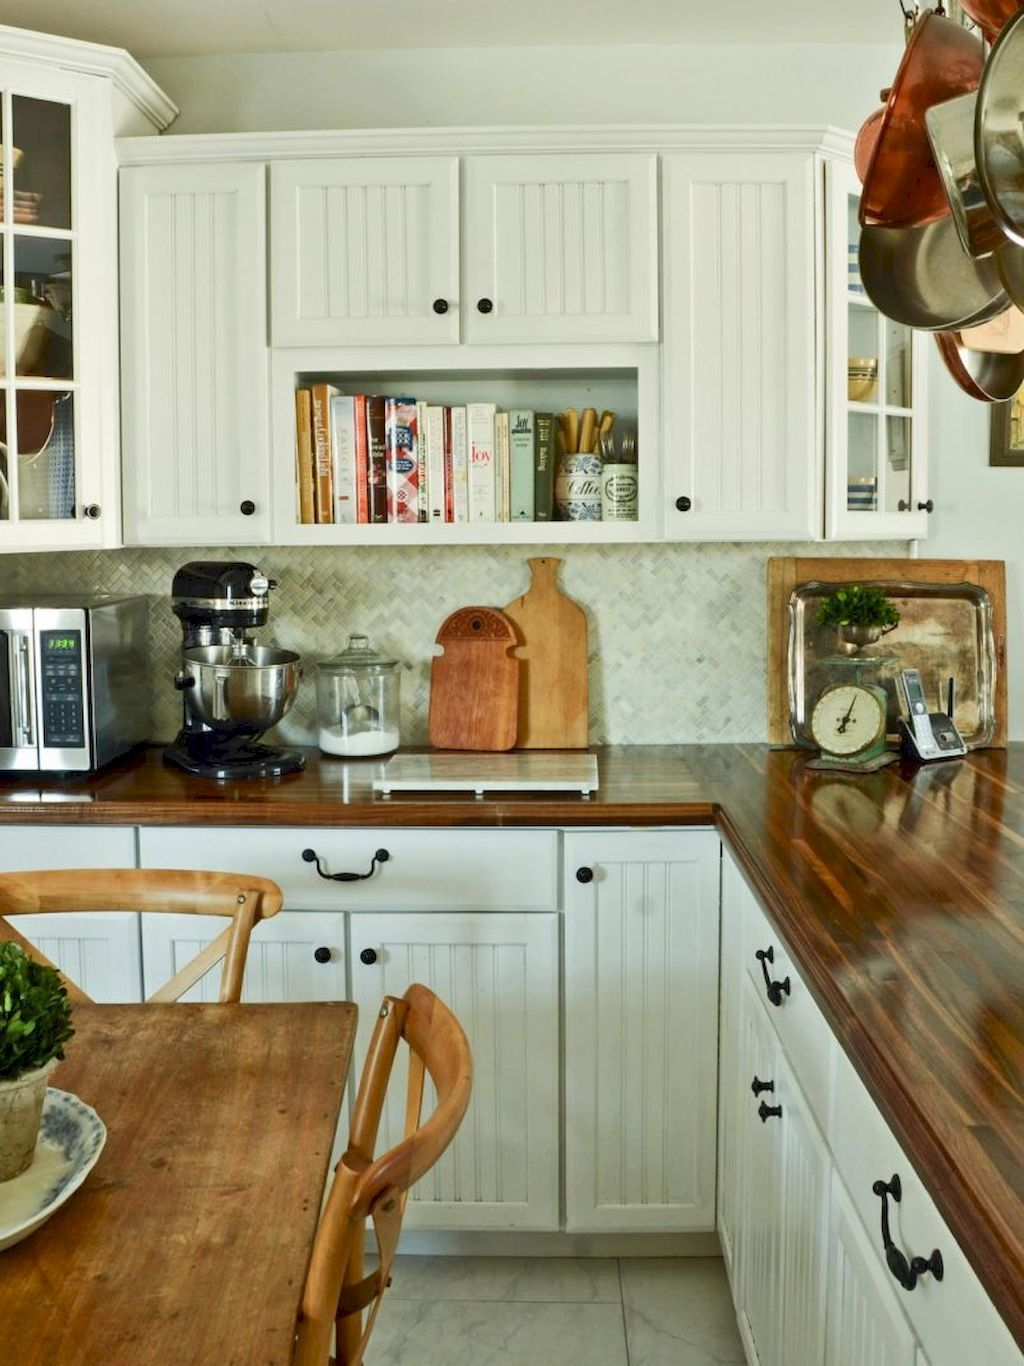 62 Beauty Farmhouse Kitchen Design and Decor Ideas